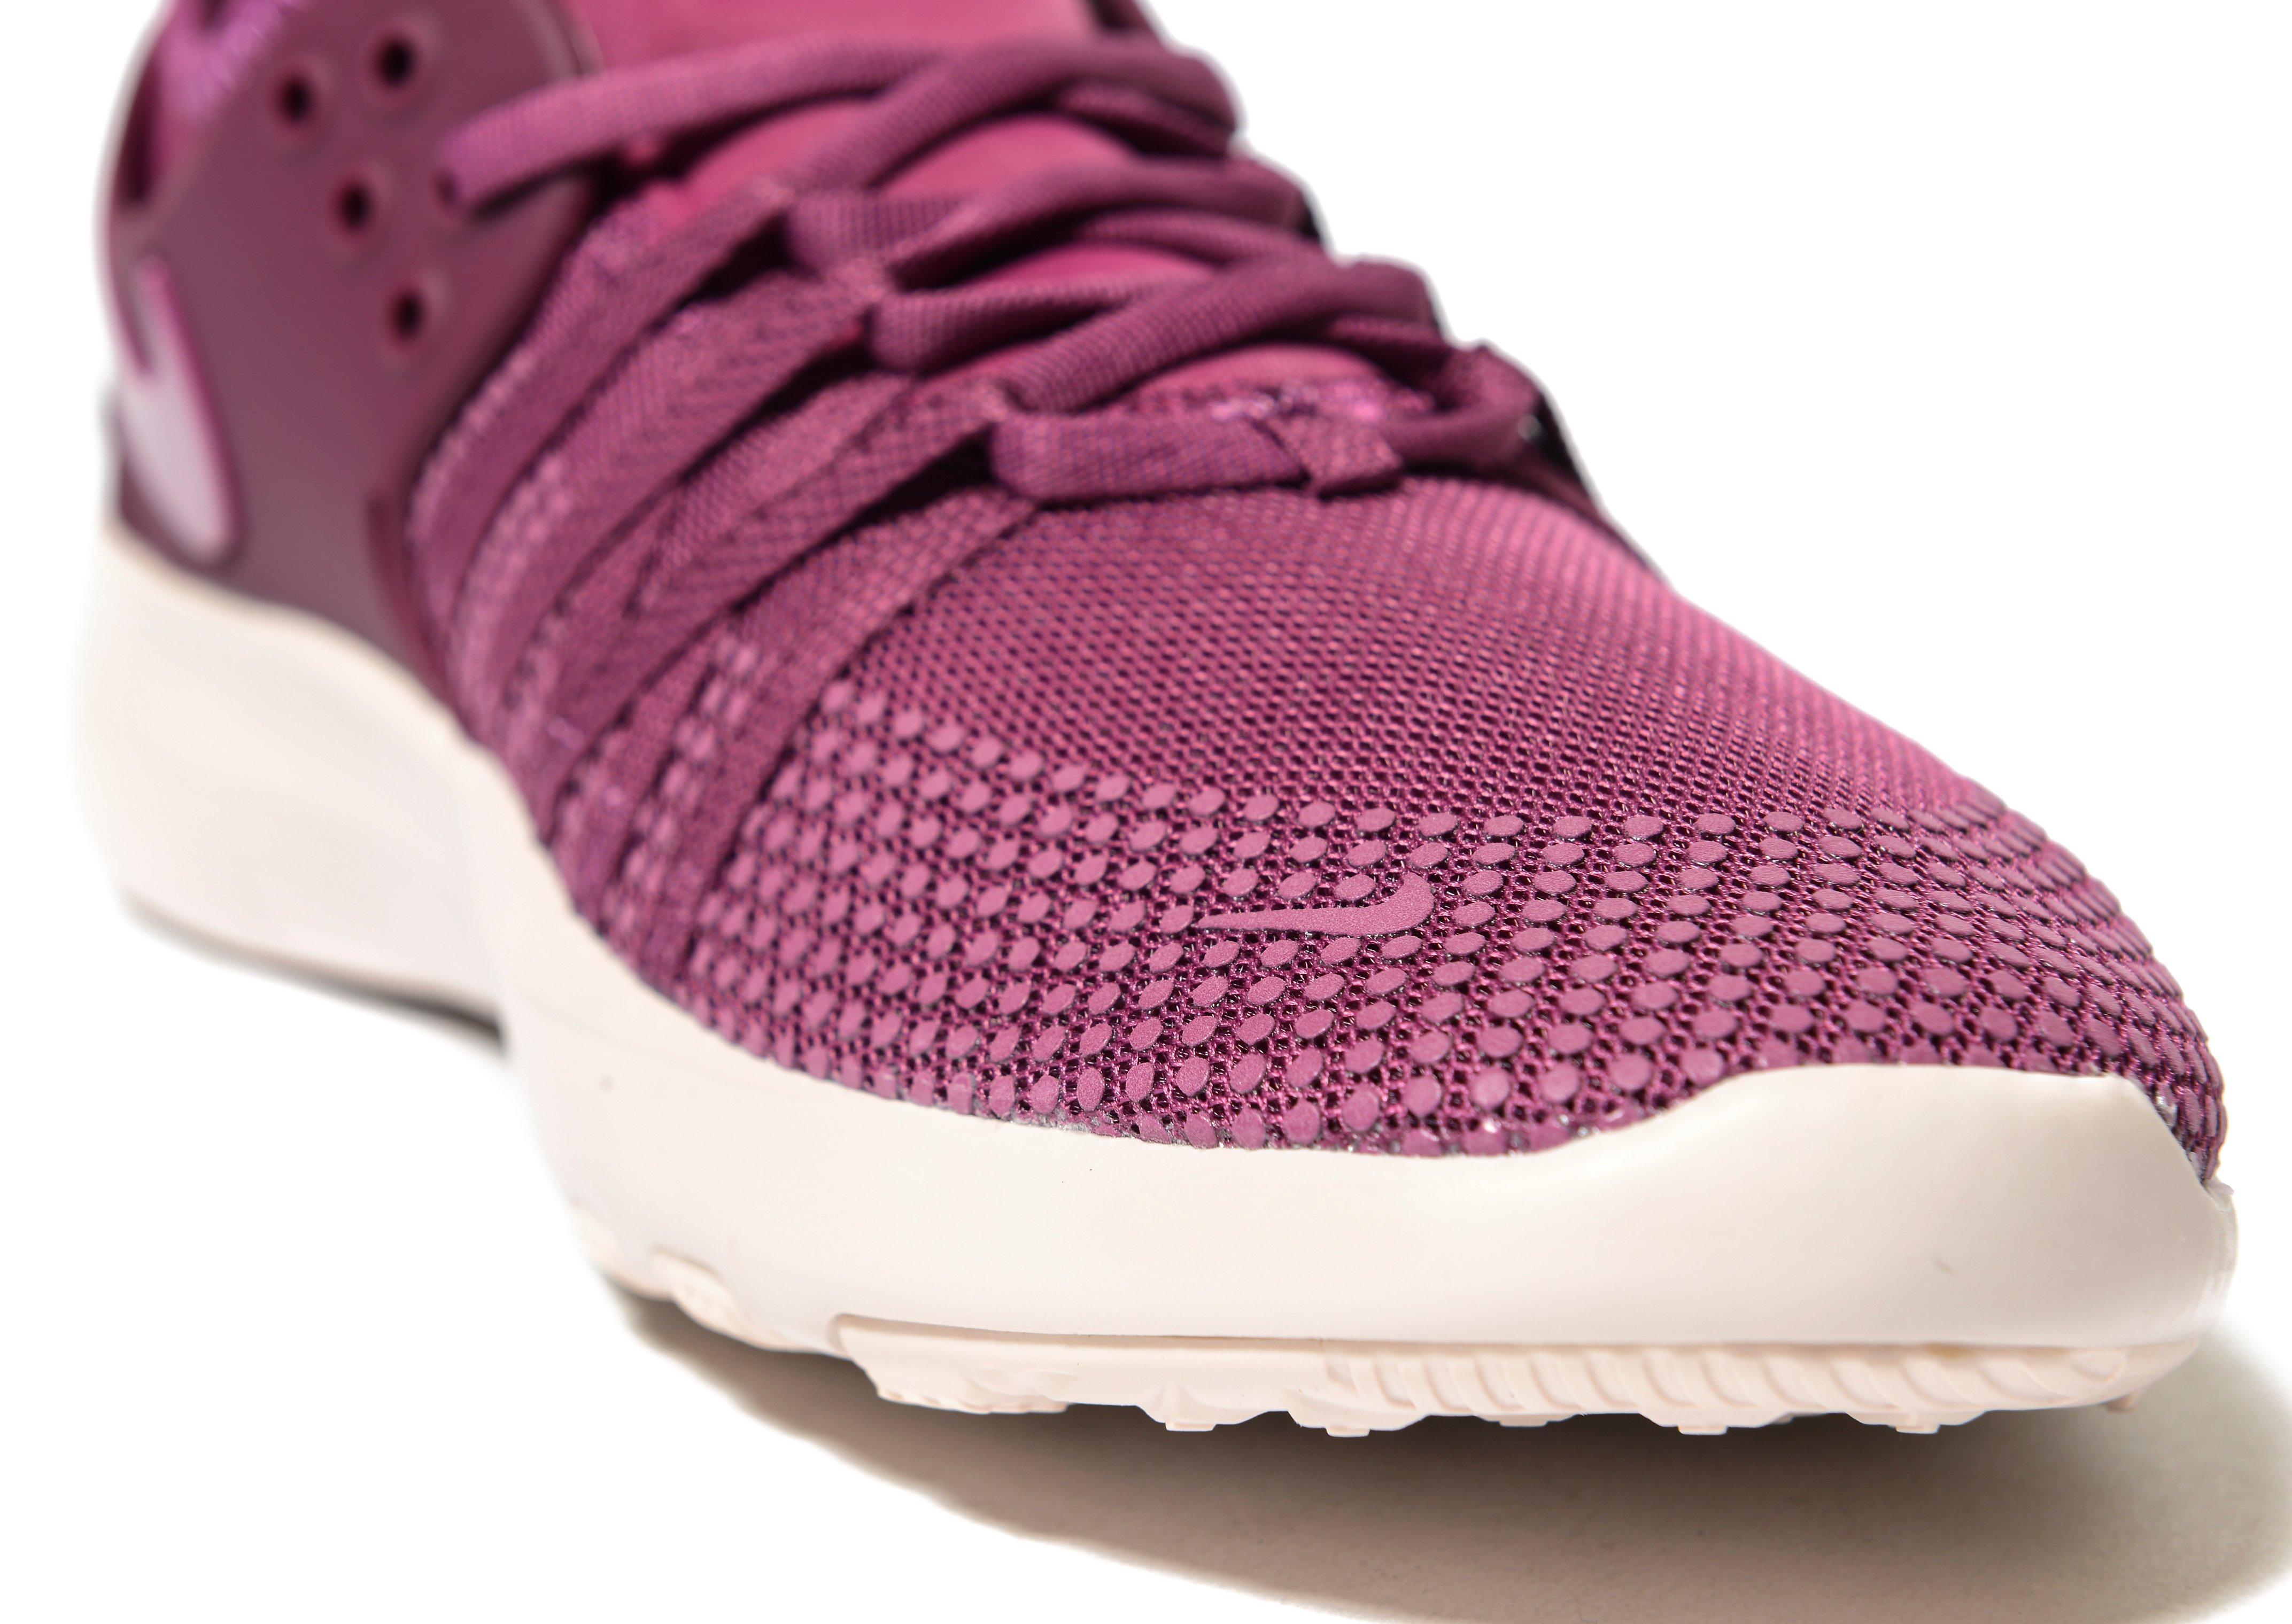 8dd3b8fe89 Red Nike Air Max 97 Plus Outlet Sale | HopShopGo